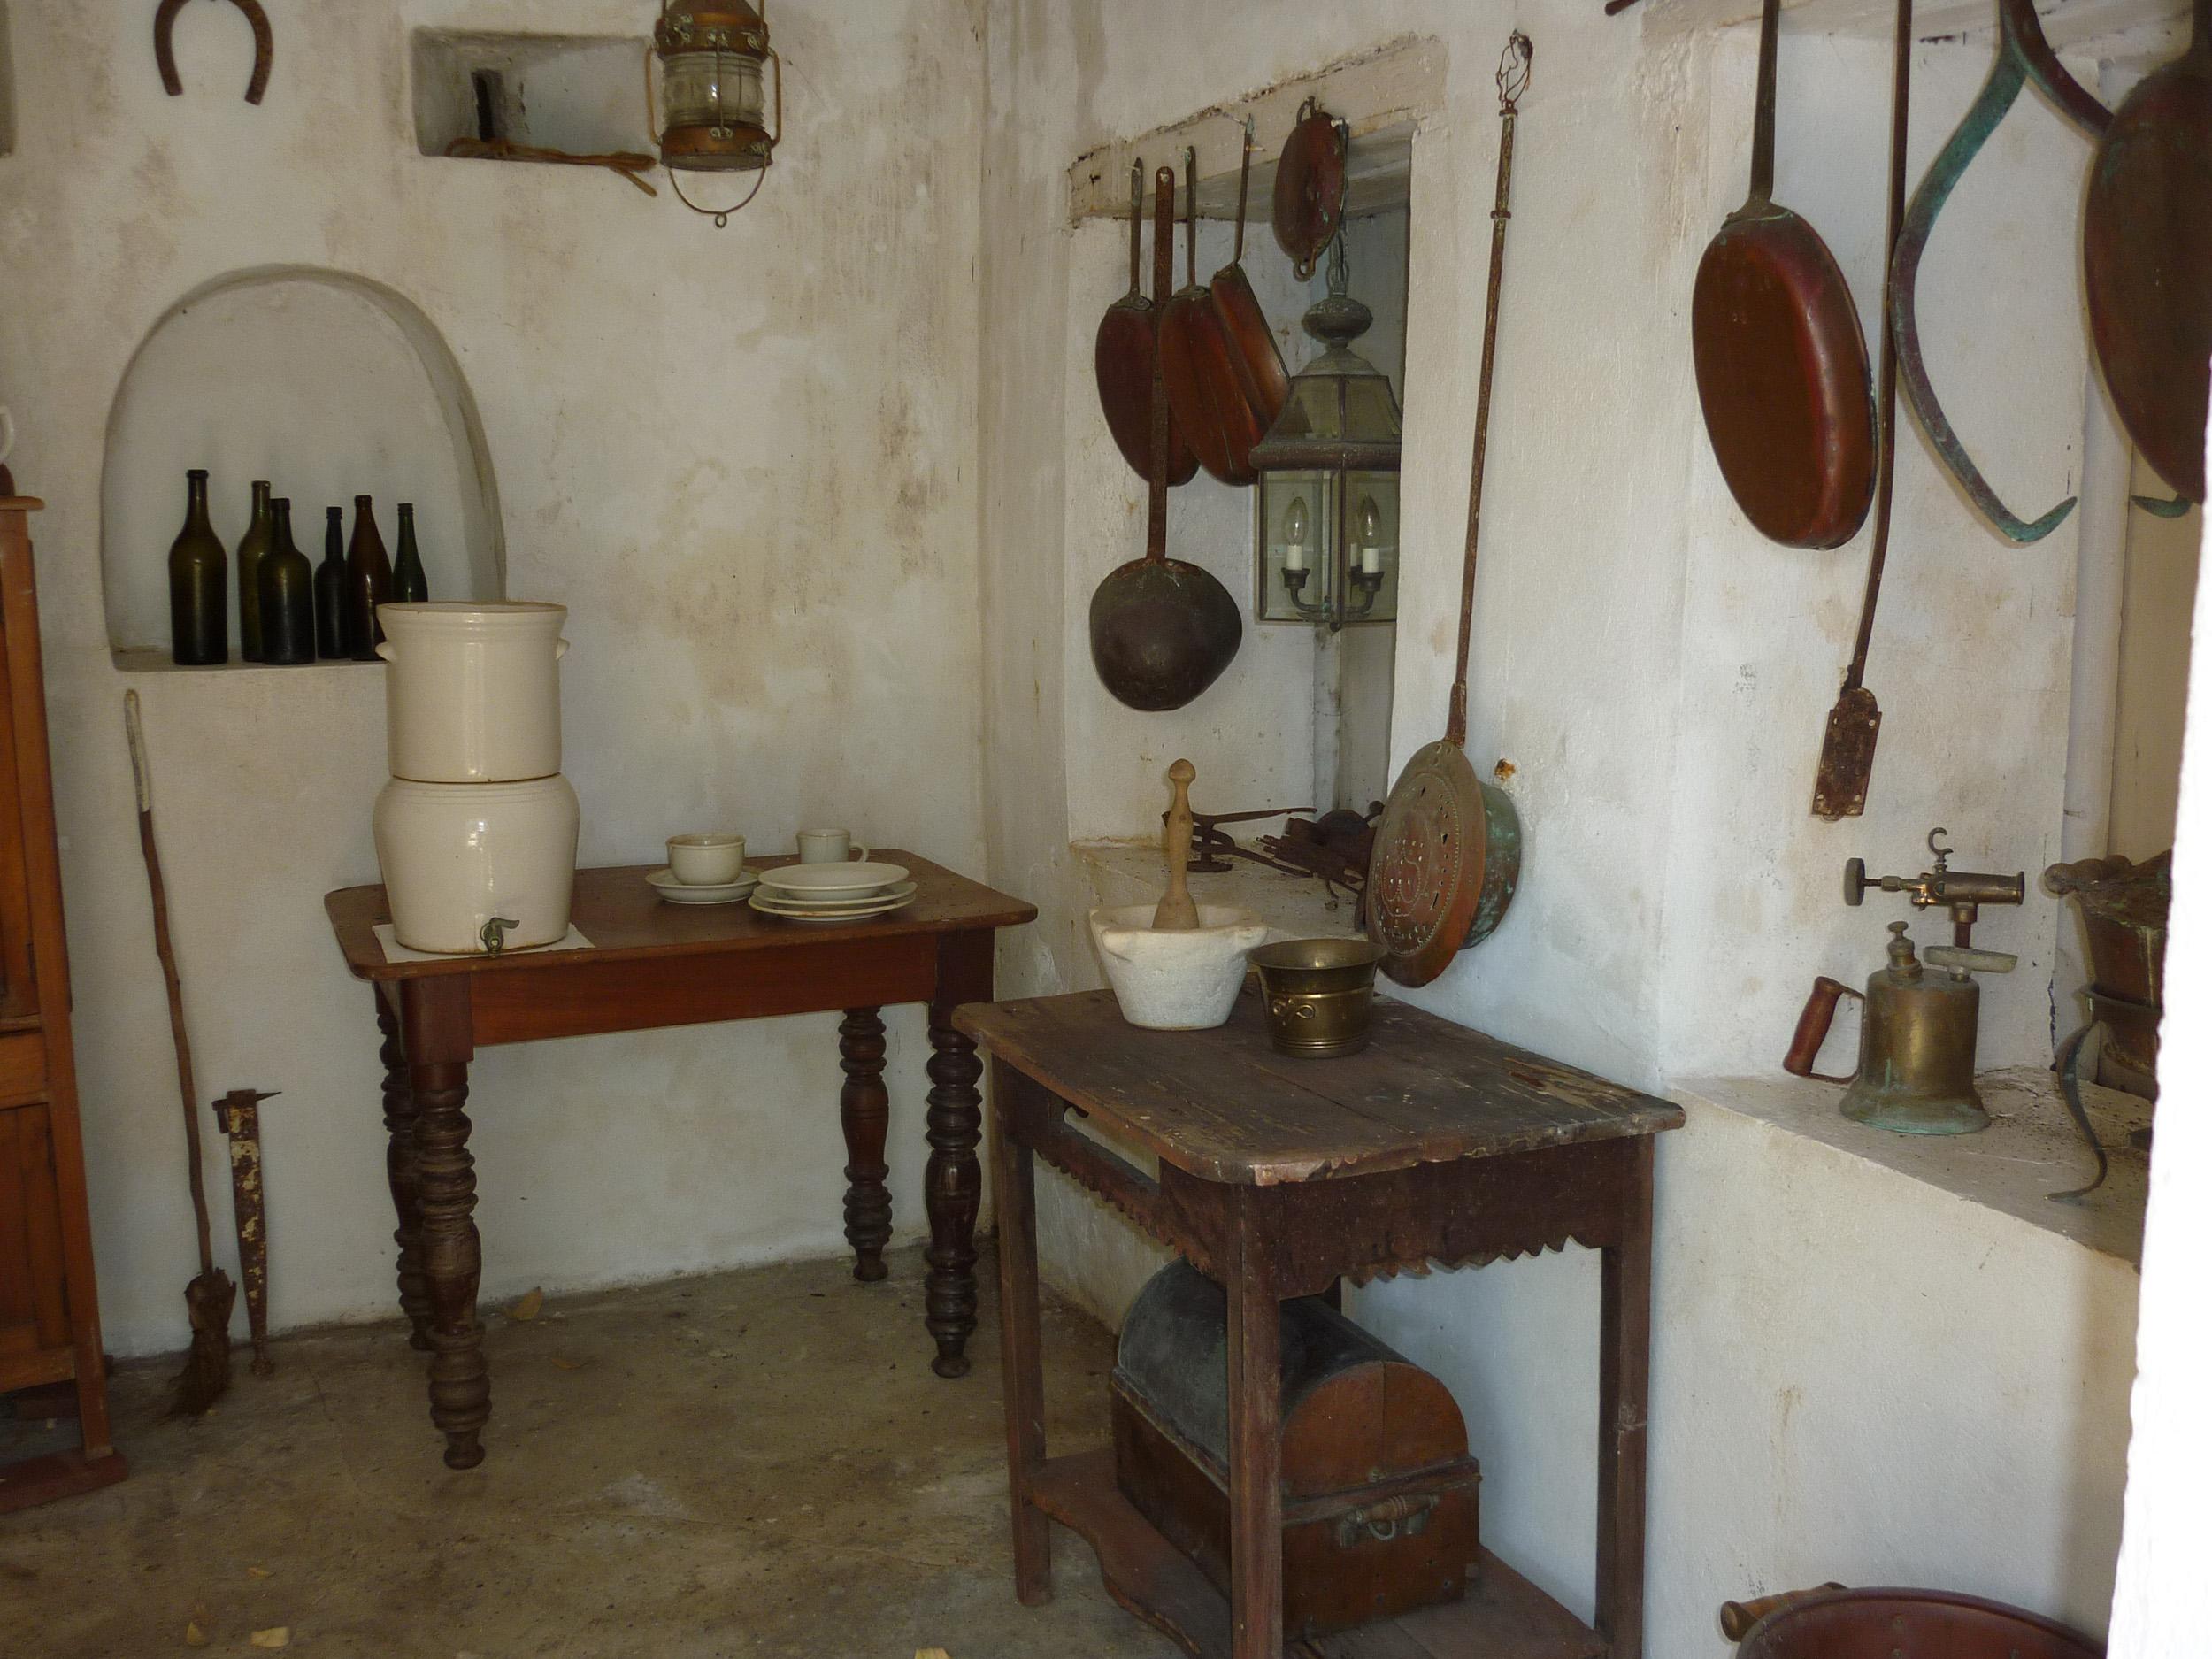 Free Stock photo of heritage kitchen  Photoeverywhere